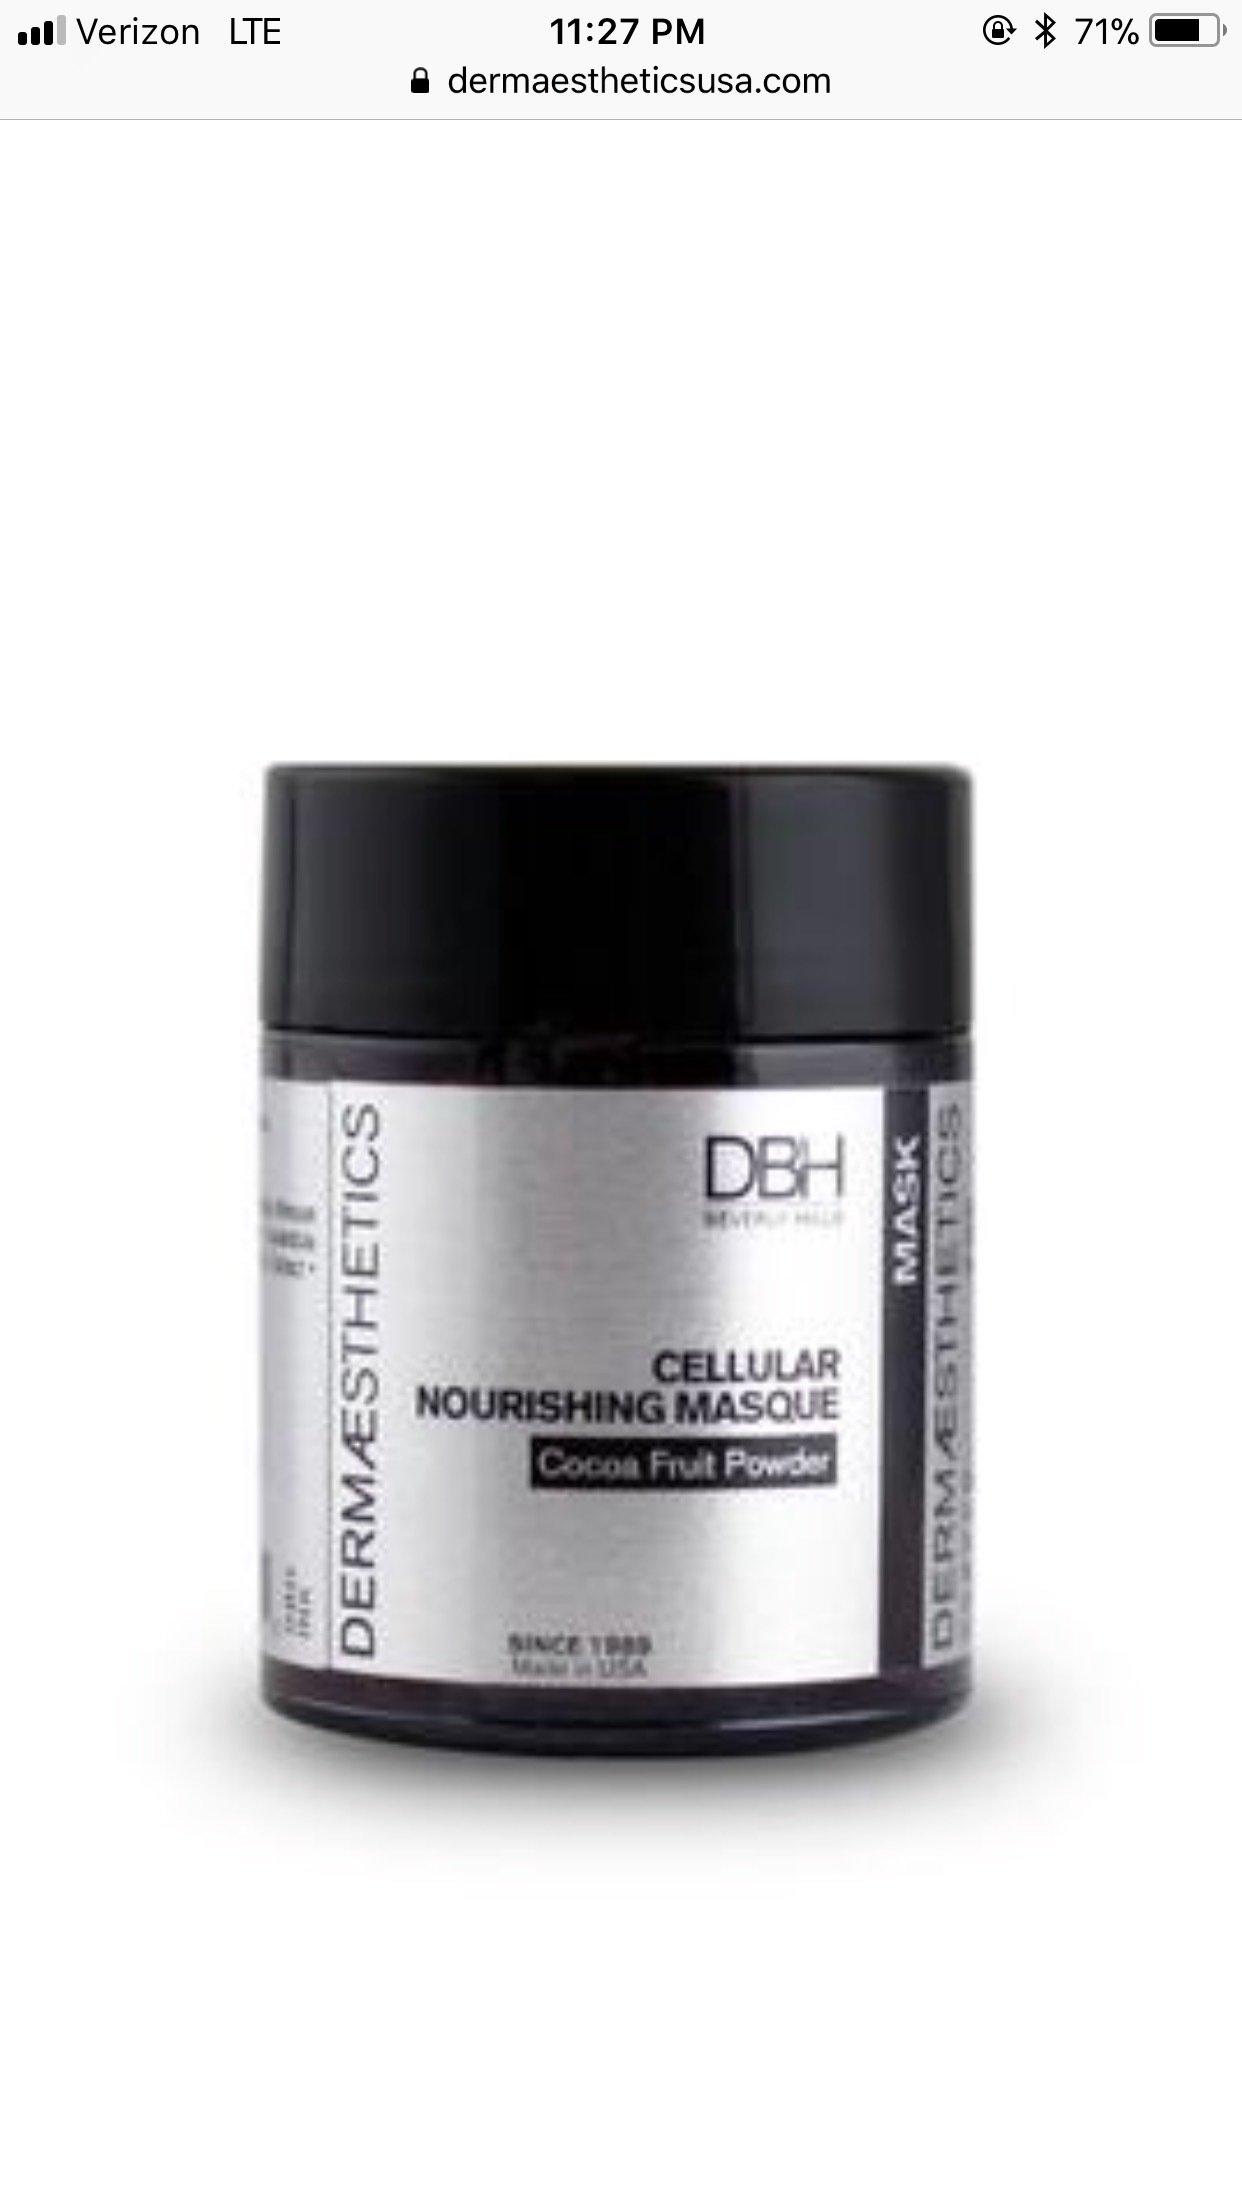 Cellular Nourishing Masque 00007